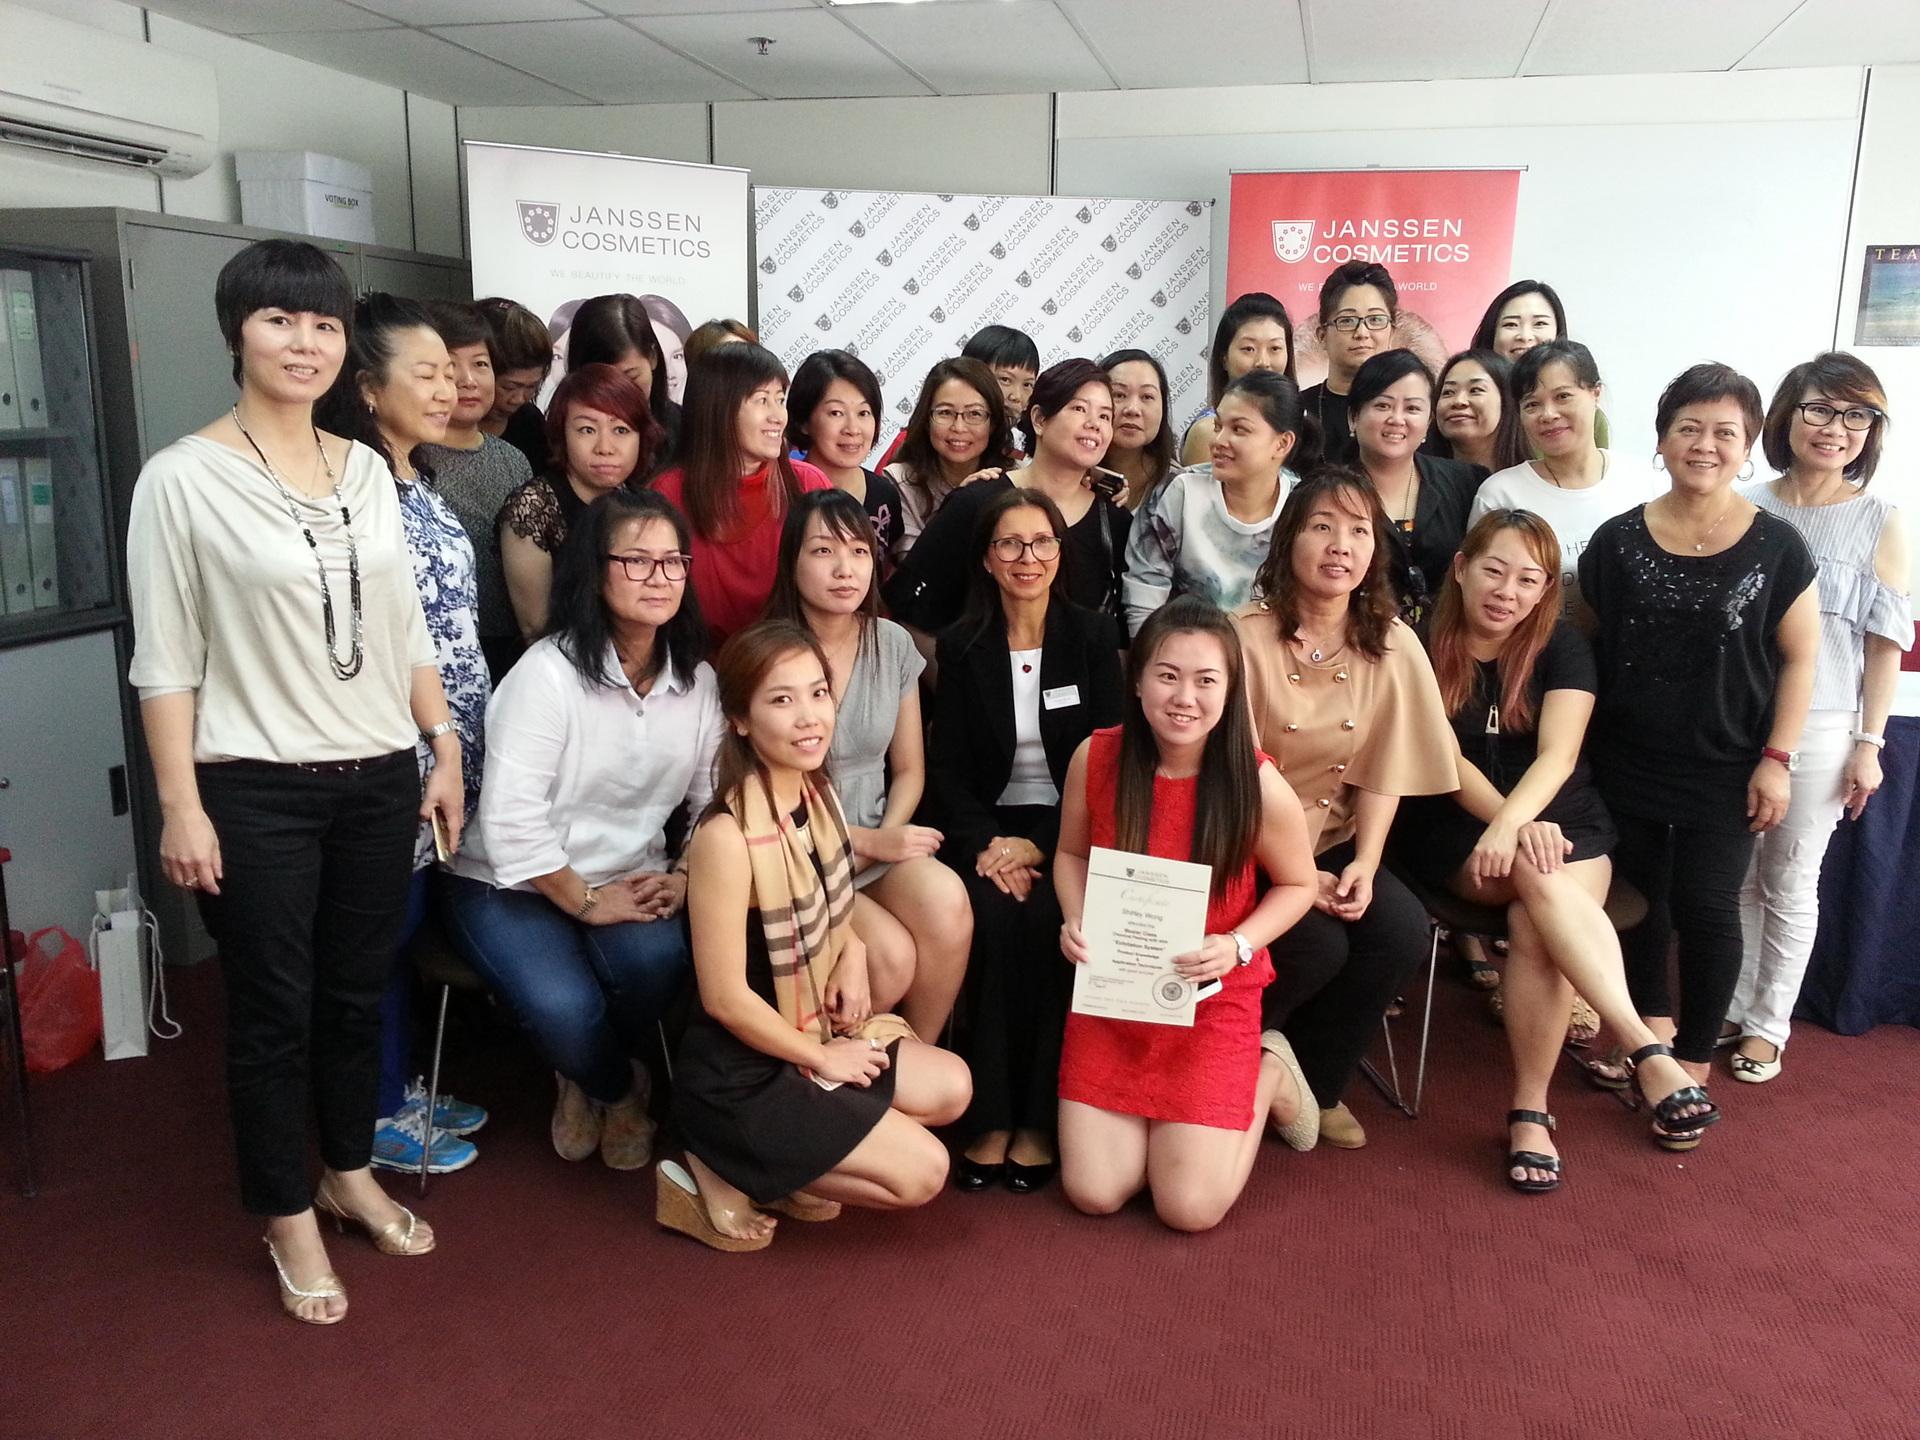 Renate beim Seminar in Kuala Lumpur 2016